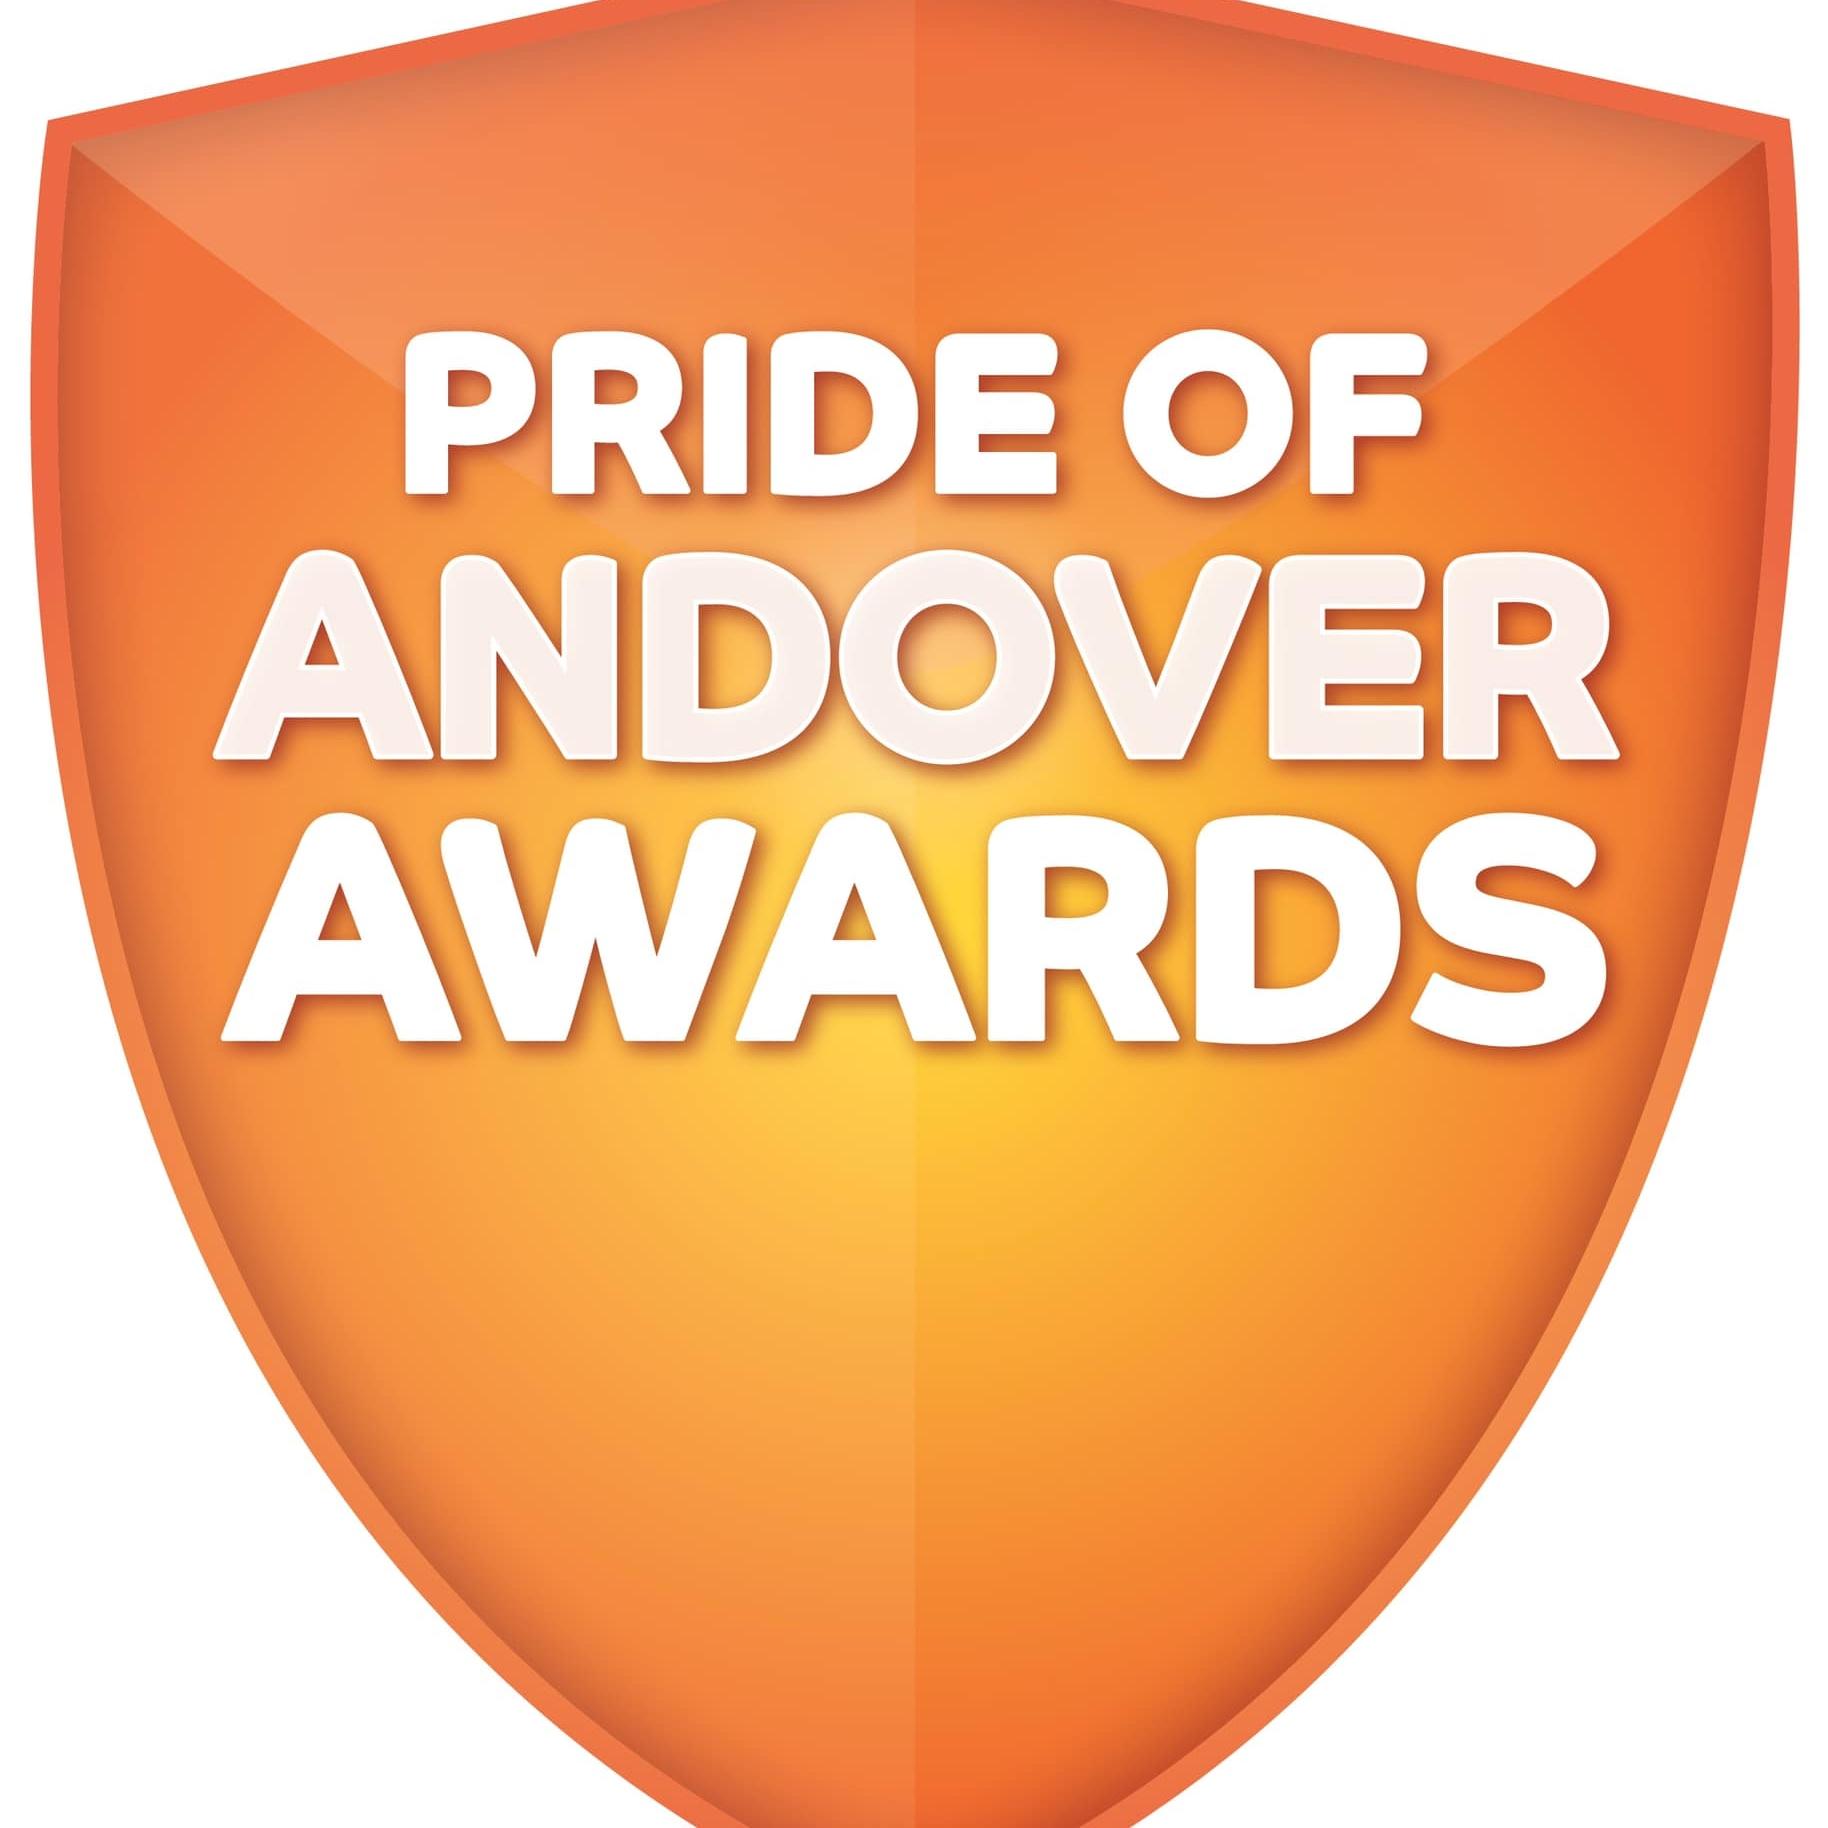 Pride of Andover awards